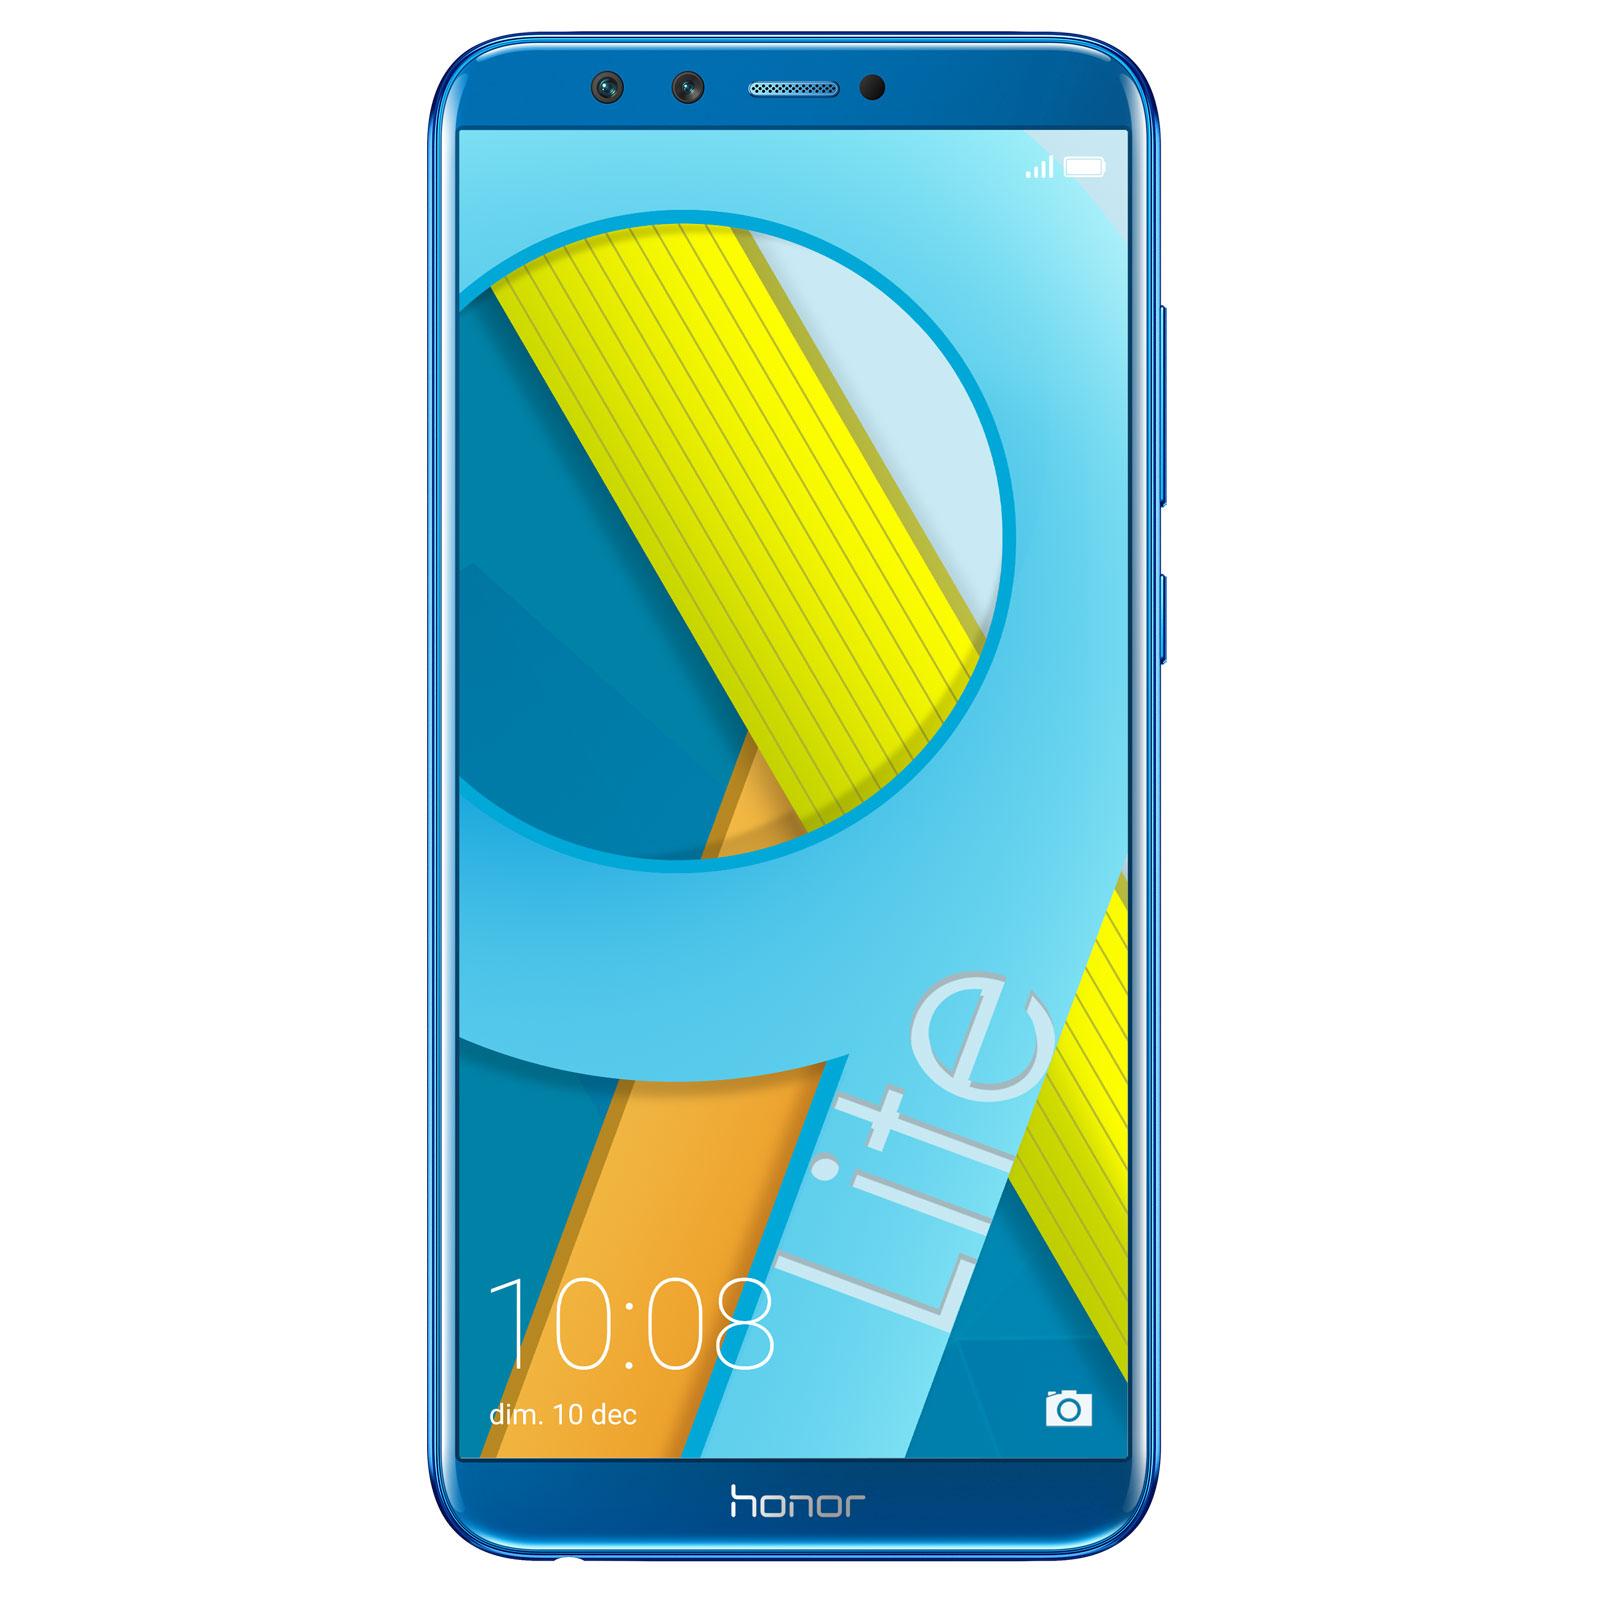 "Mobile & smartphone Honor 9 Lite Bleu (3 Go / 32 Go) Smartphone 4G-LTE Dual SIM - Kirin 659 8-Core 2,36 GHz - RAM 3 Go - Ecran tactile 5.65"" 1080 x 2160 - 32 Go - NFC/Bluetooth 4.2 - 3000 mAh - Android 8.0"